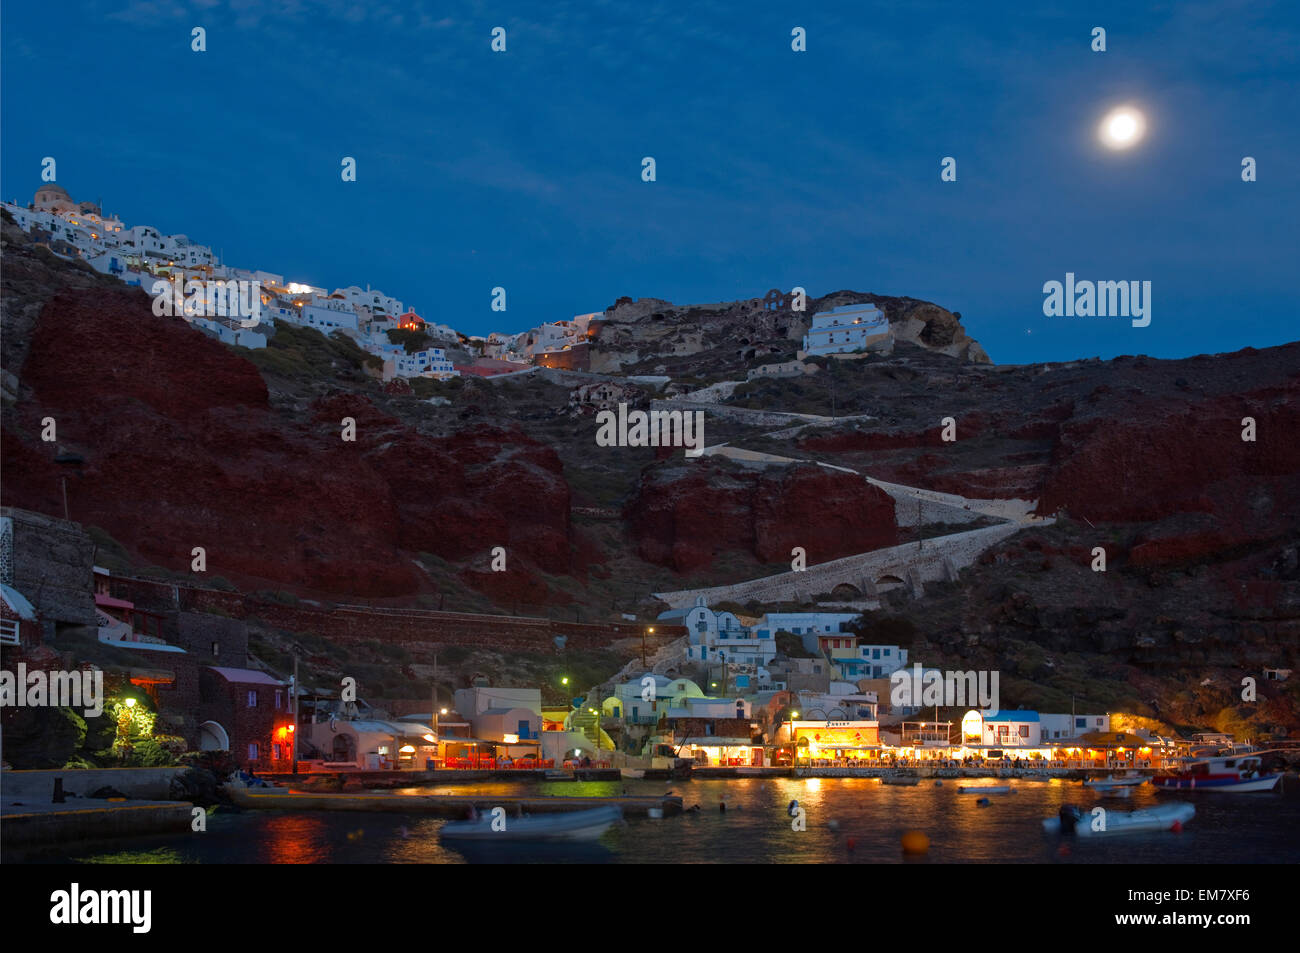 Griechenland, Kykladen, Santorini, Ammoudi, Blick über den Hafen auf Oia - Stock Image